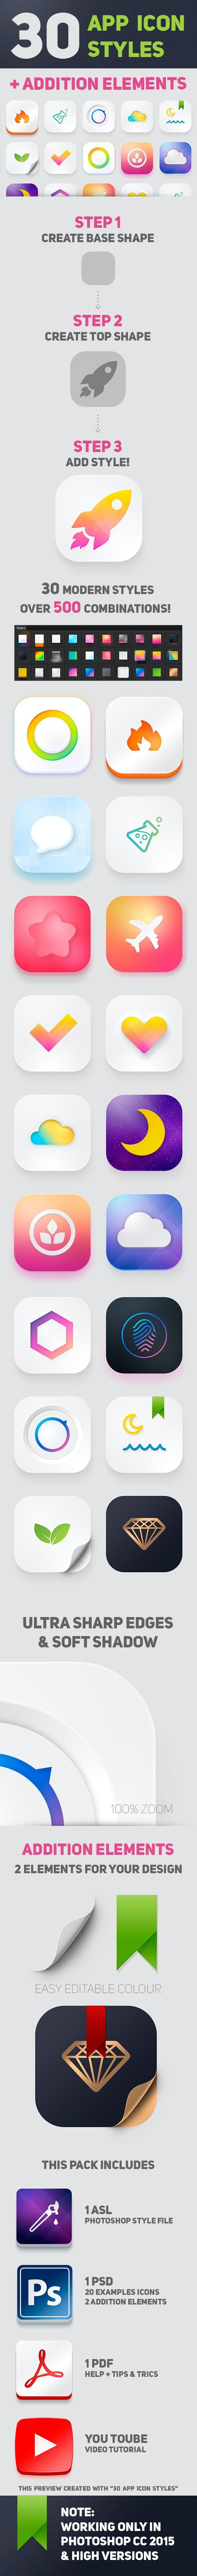 30 App Icon Styles - Styles Photoshop